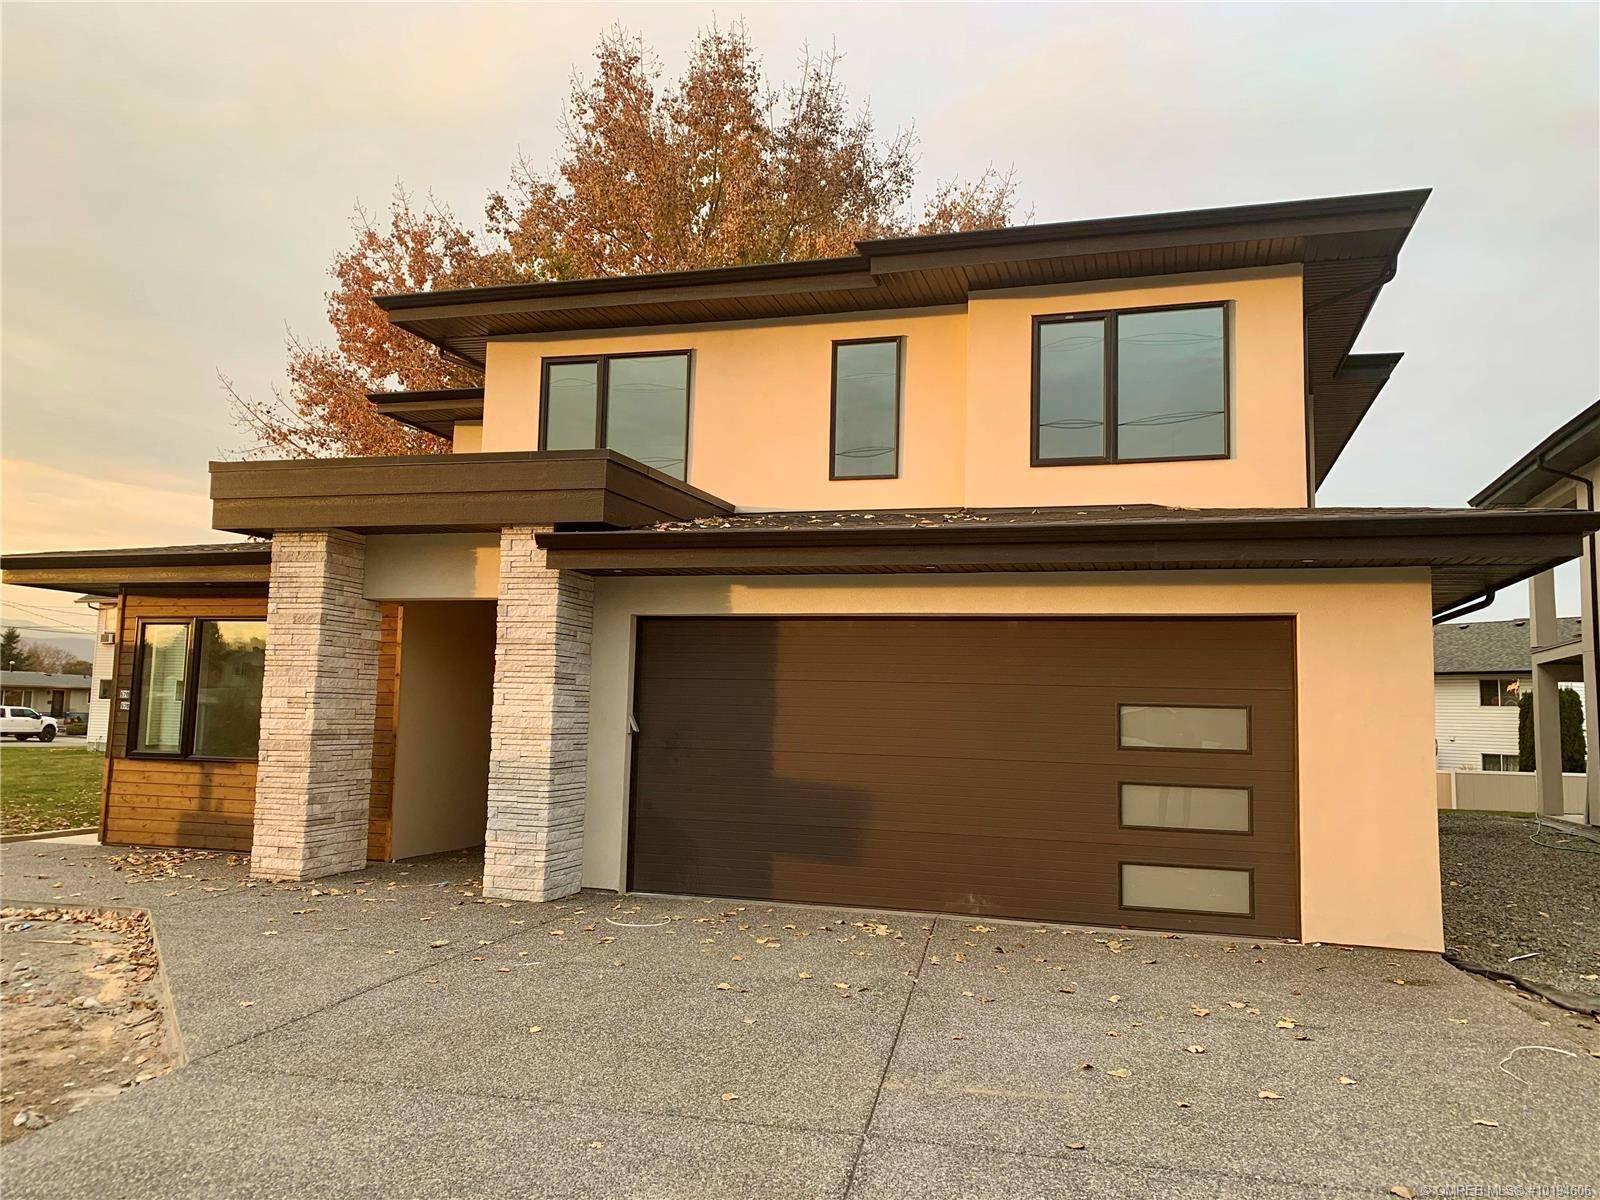 House for sale at 570 Mckenzie Rd Kelowna British Columbia - MLS: 10194606